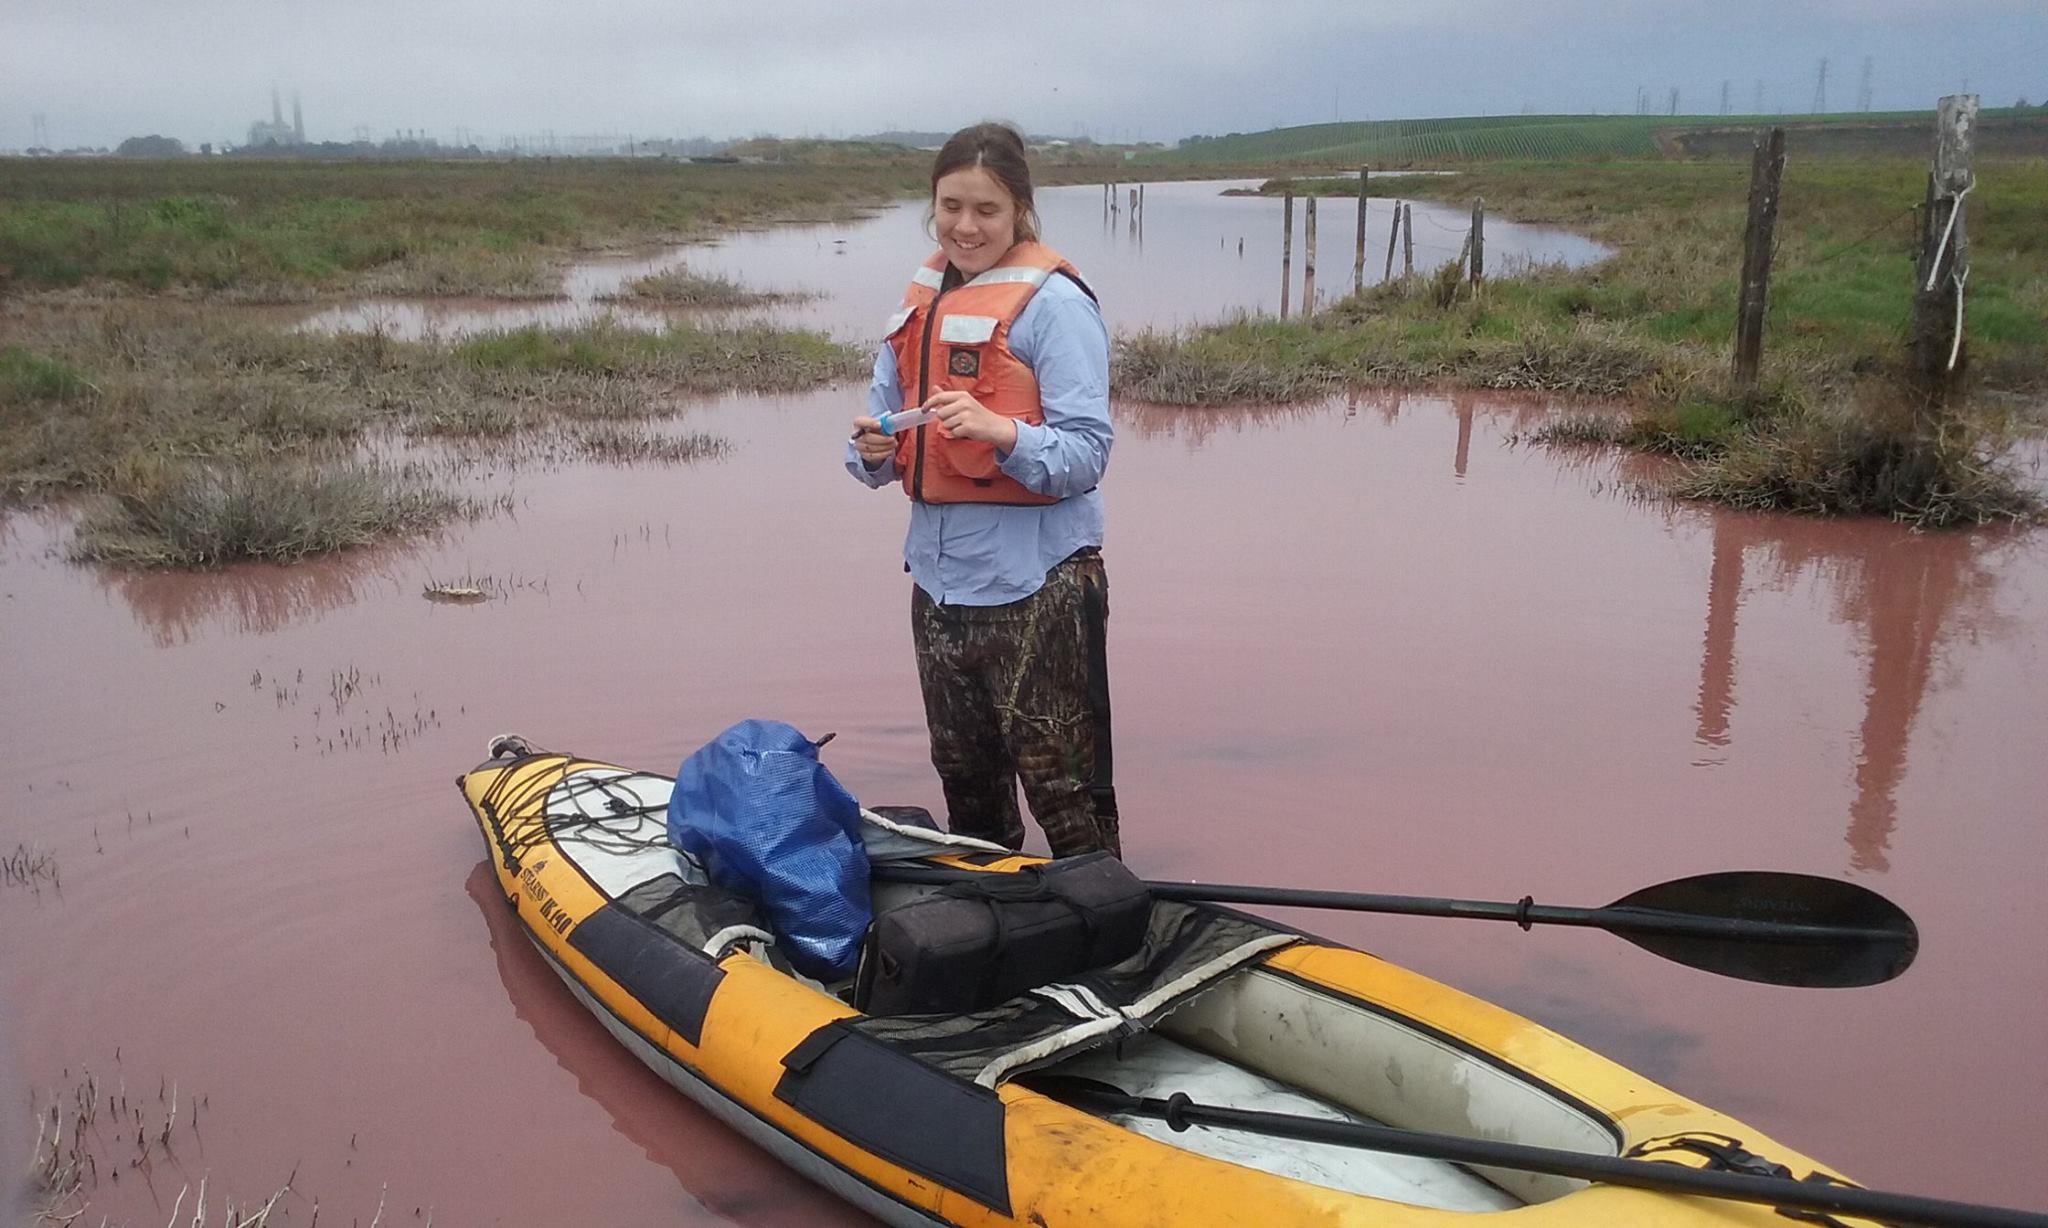 Miranda collecting water samples by kayak